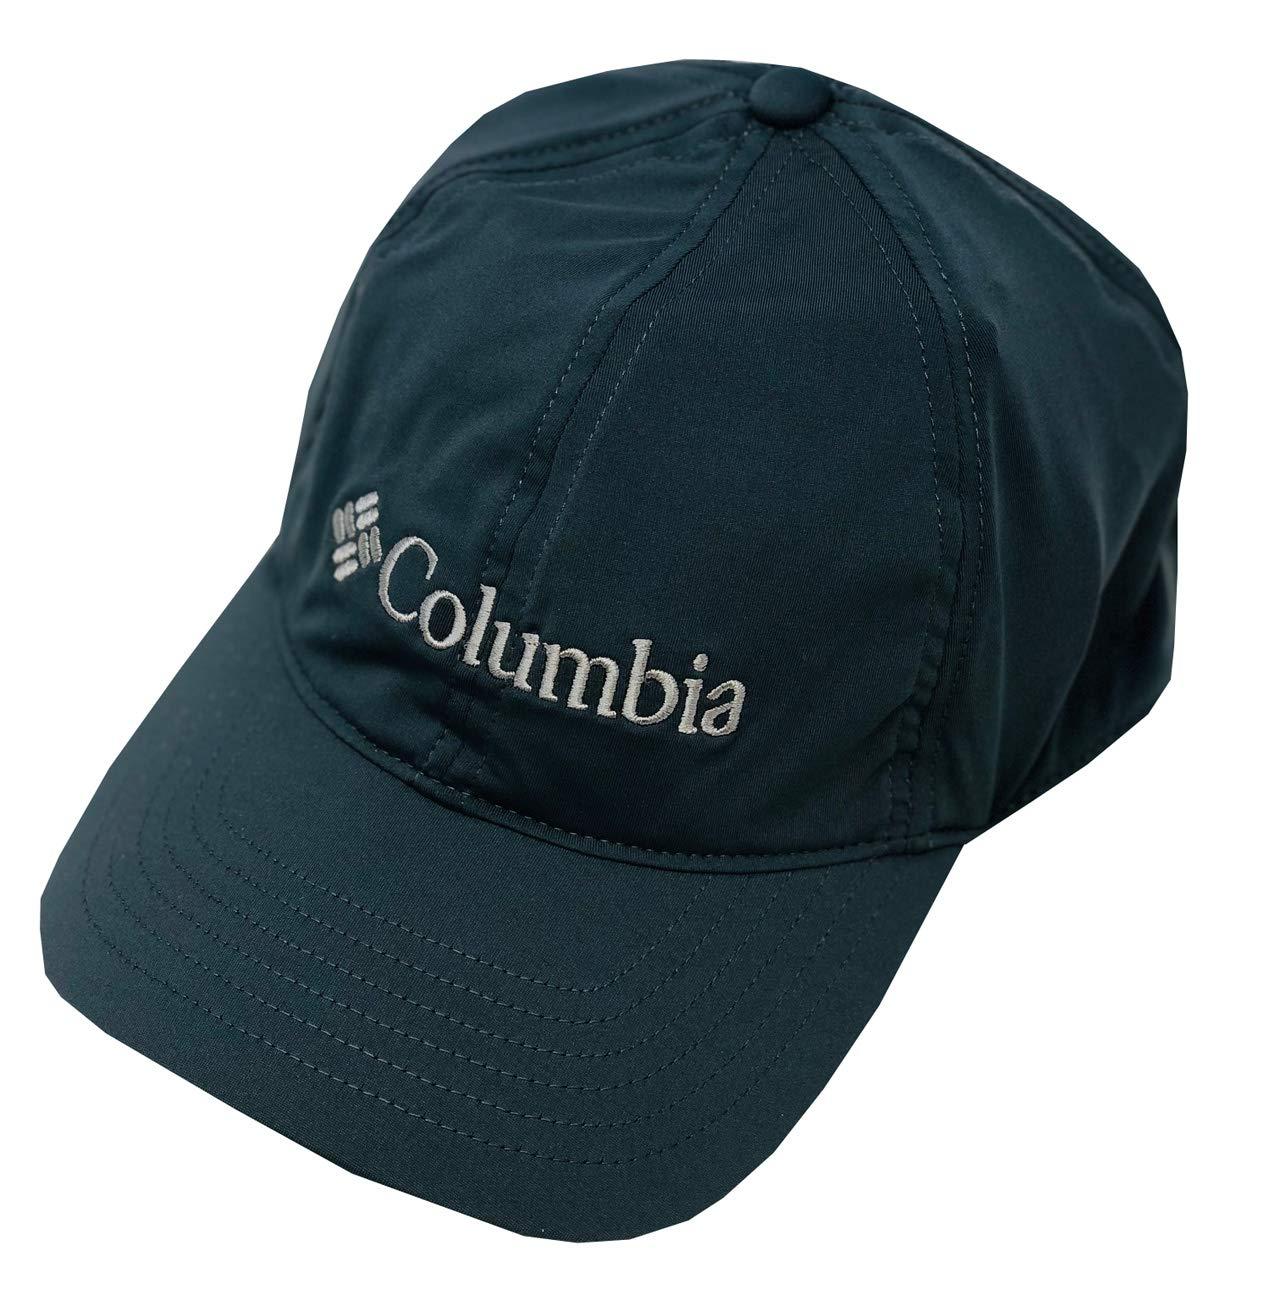 Columbia Unisex Omni-Freeze Zero Midway Park Adjustable Ballcap Hat (One Size, Grey)